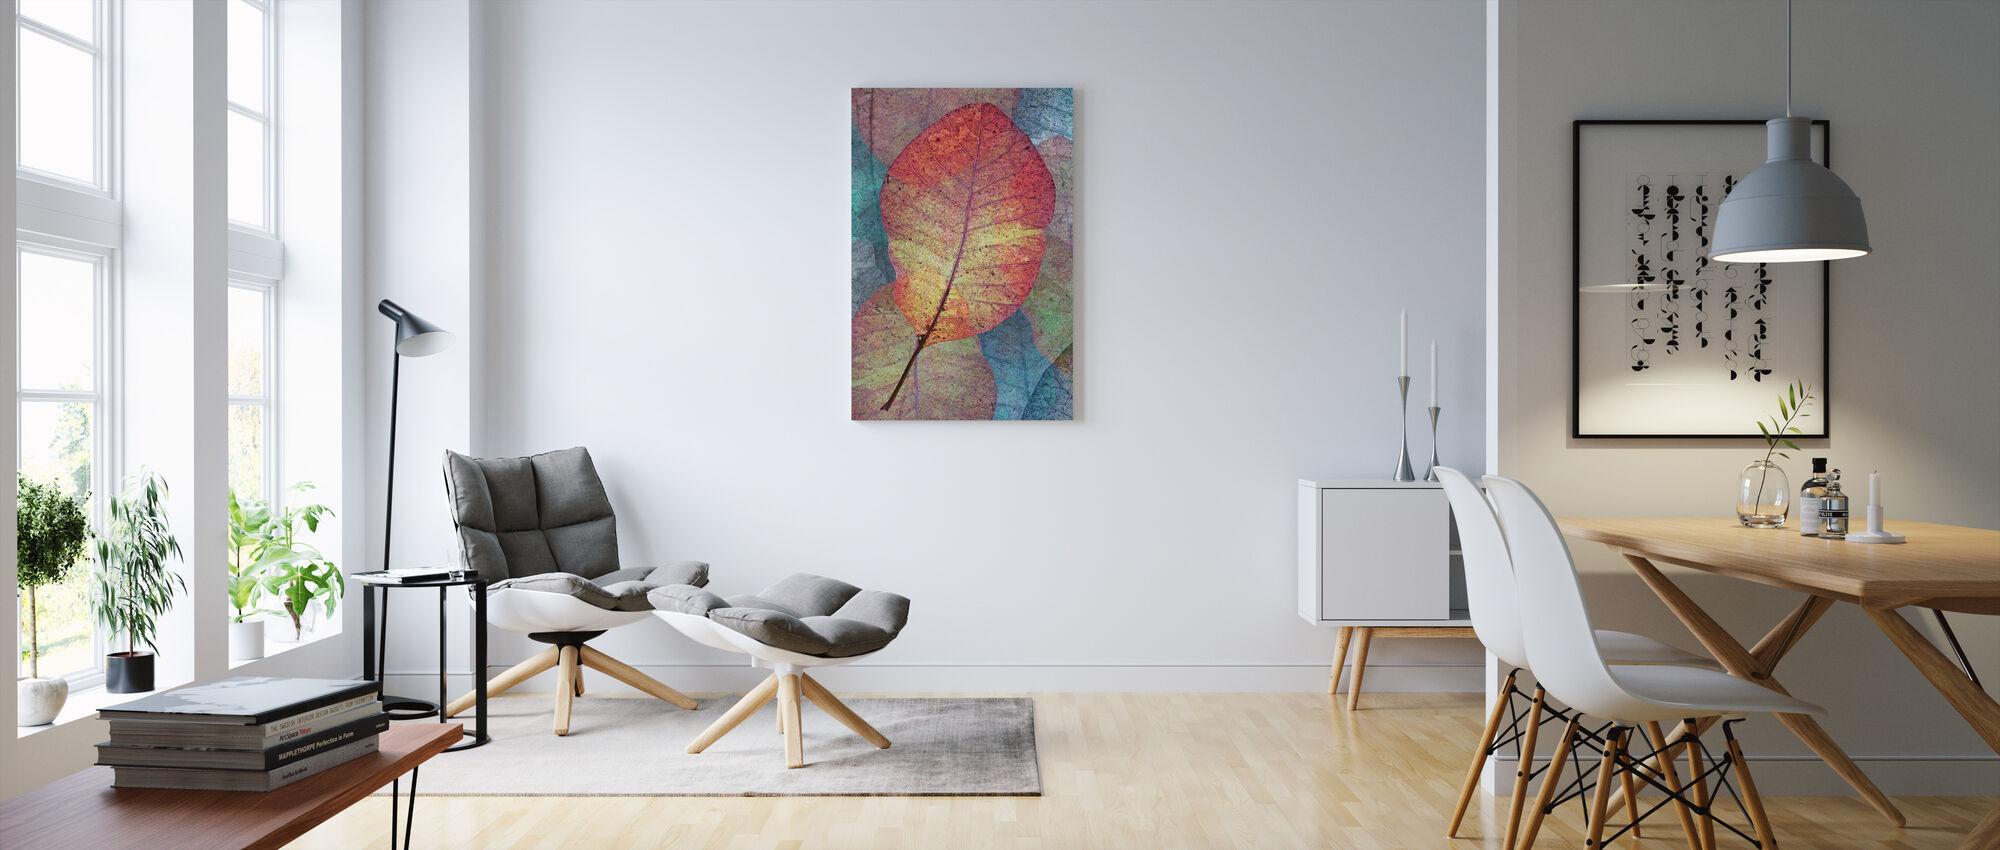 Red Leaf Pattern - Canvas print - Living Room